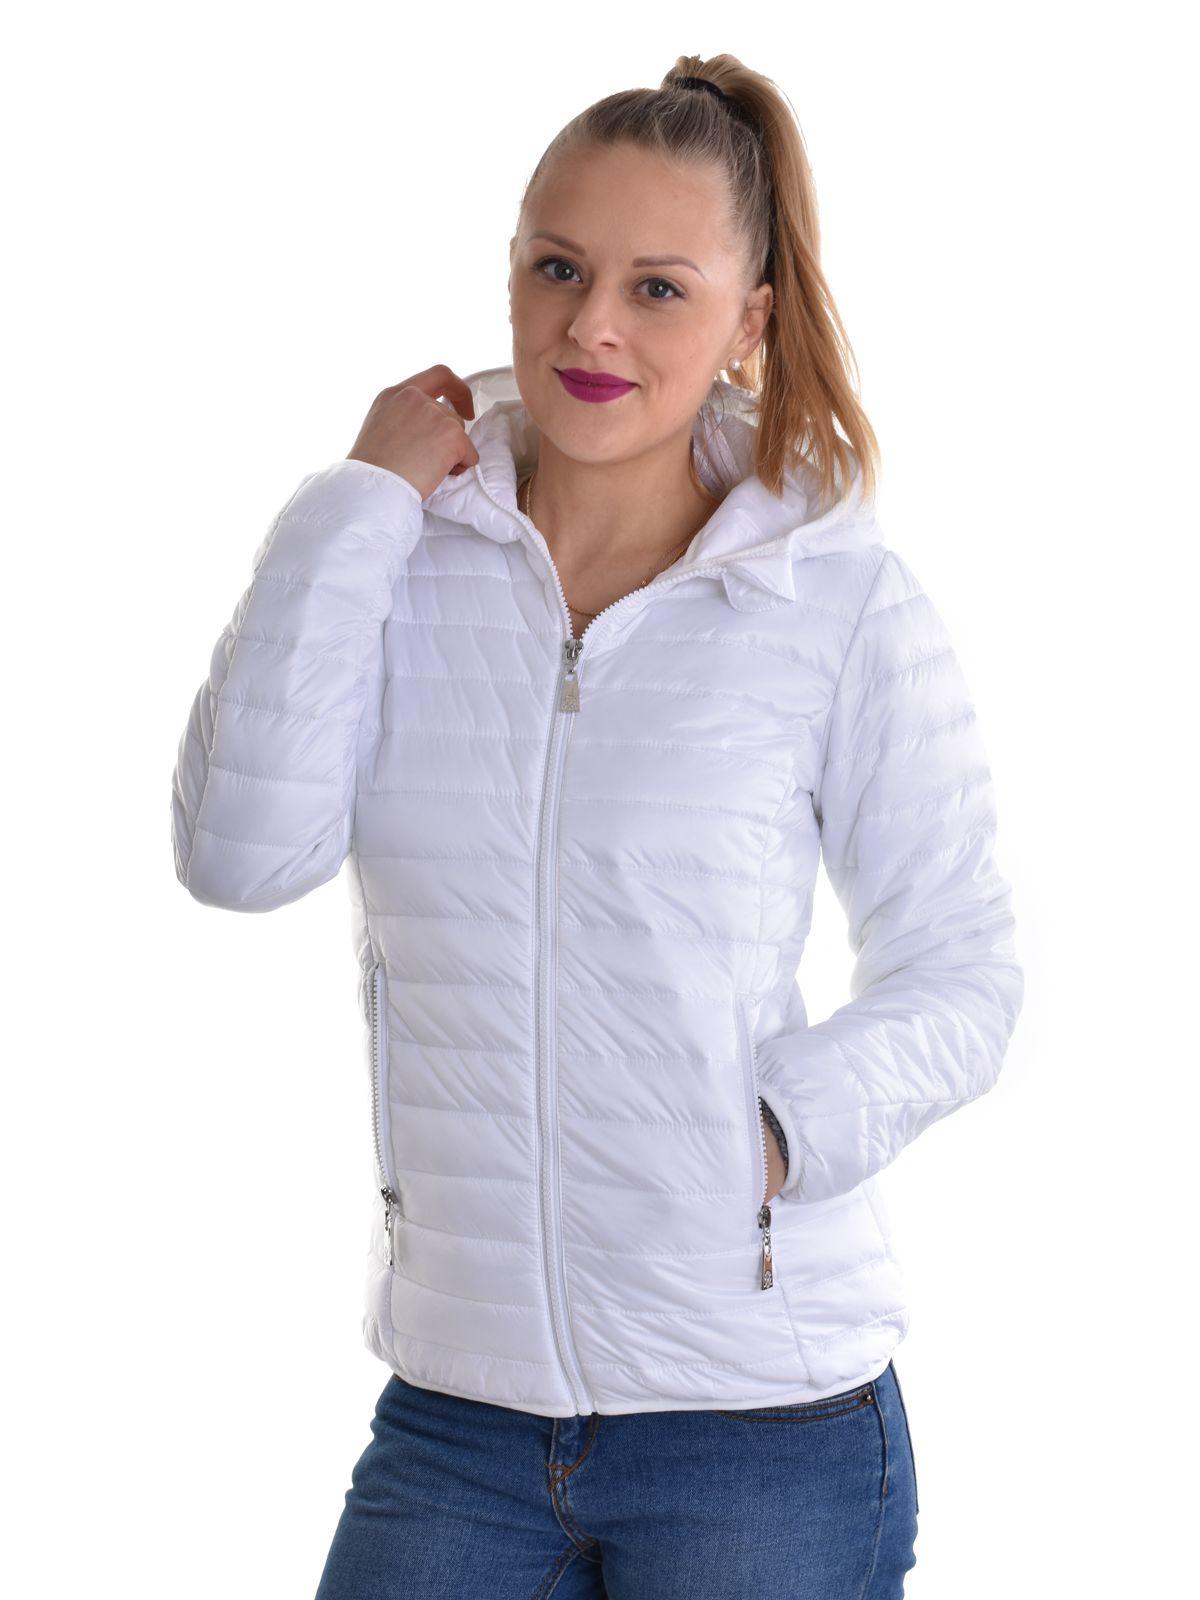 Mayo Chix női dzseki MITTEN | Markasbolt.hu Hivatalos Mayo